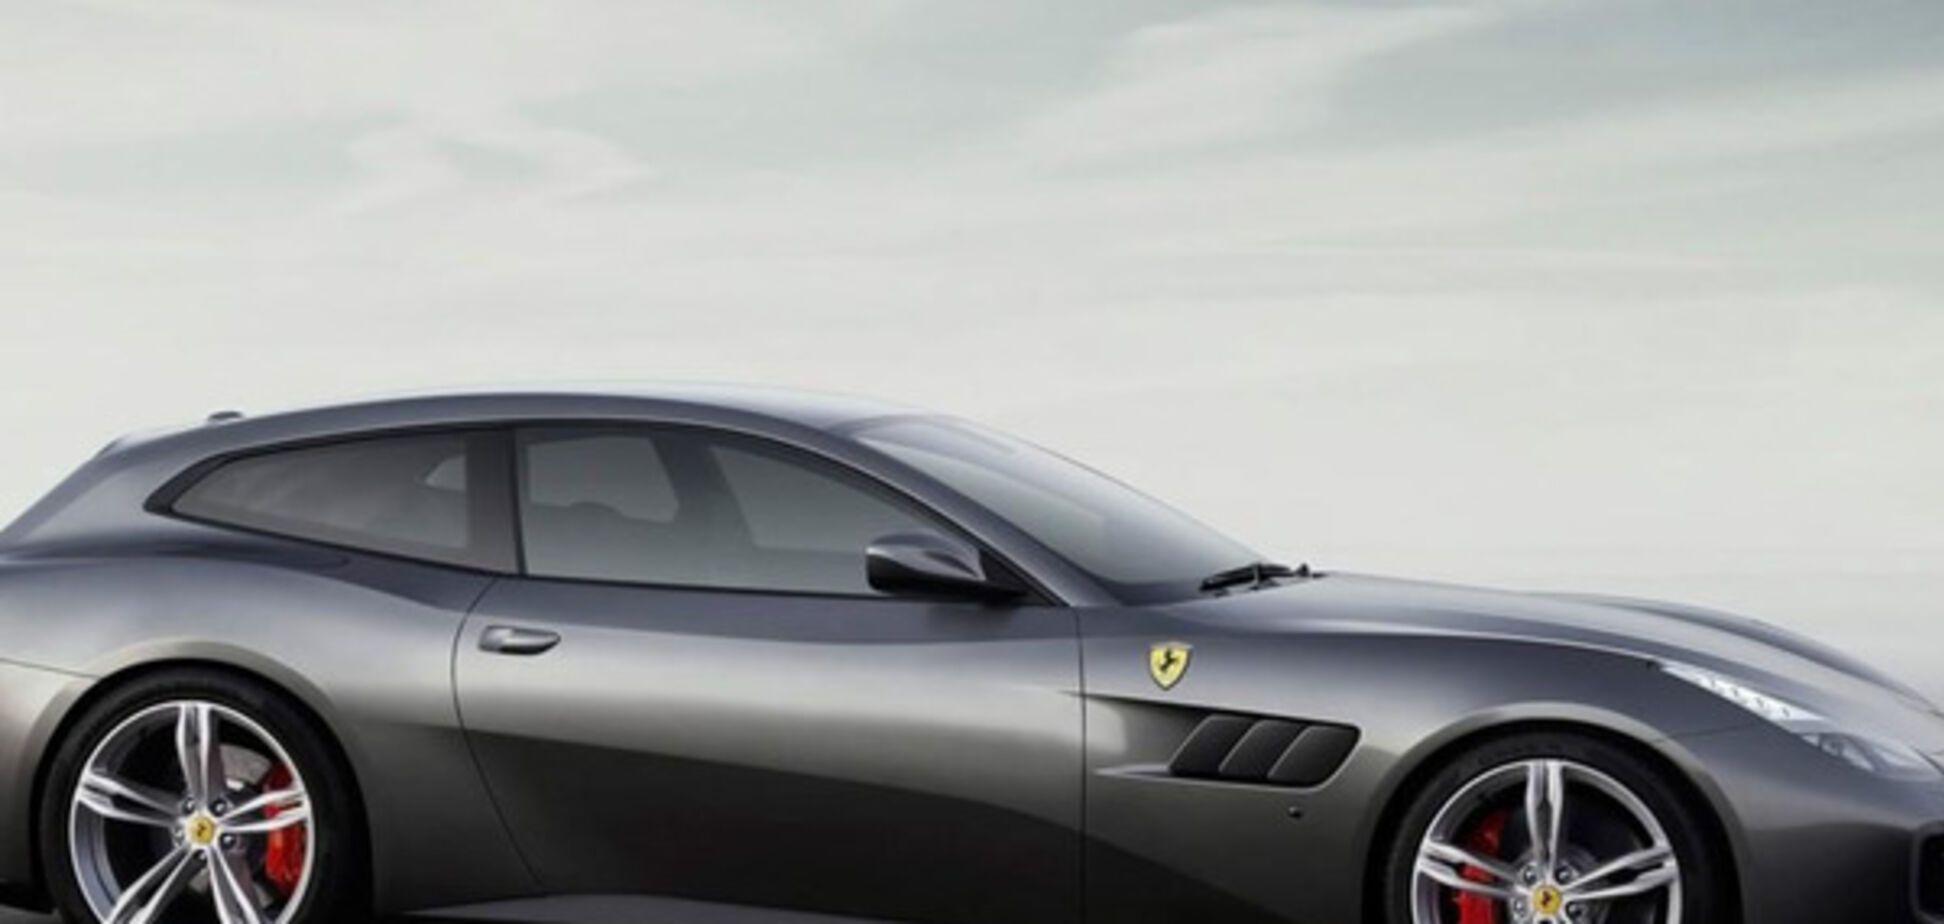 Ferrari GTC4 Lusso, авто